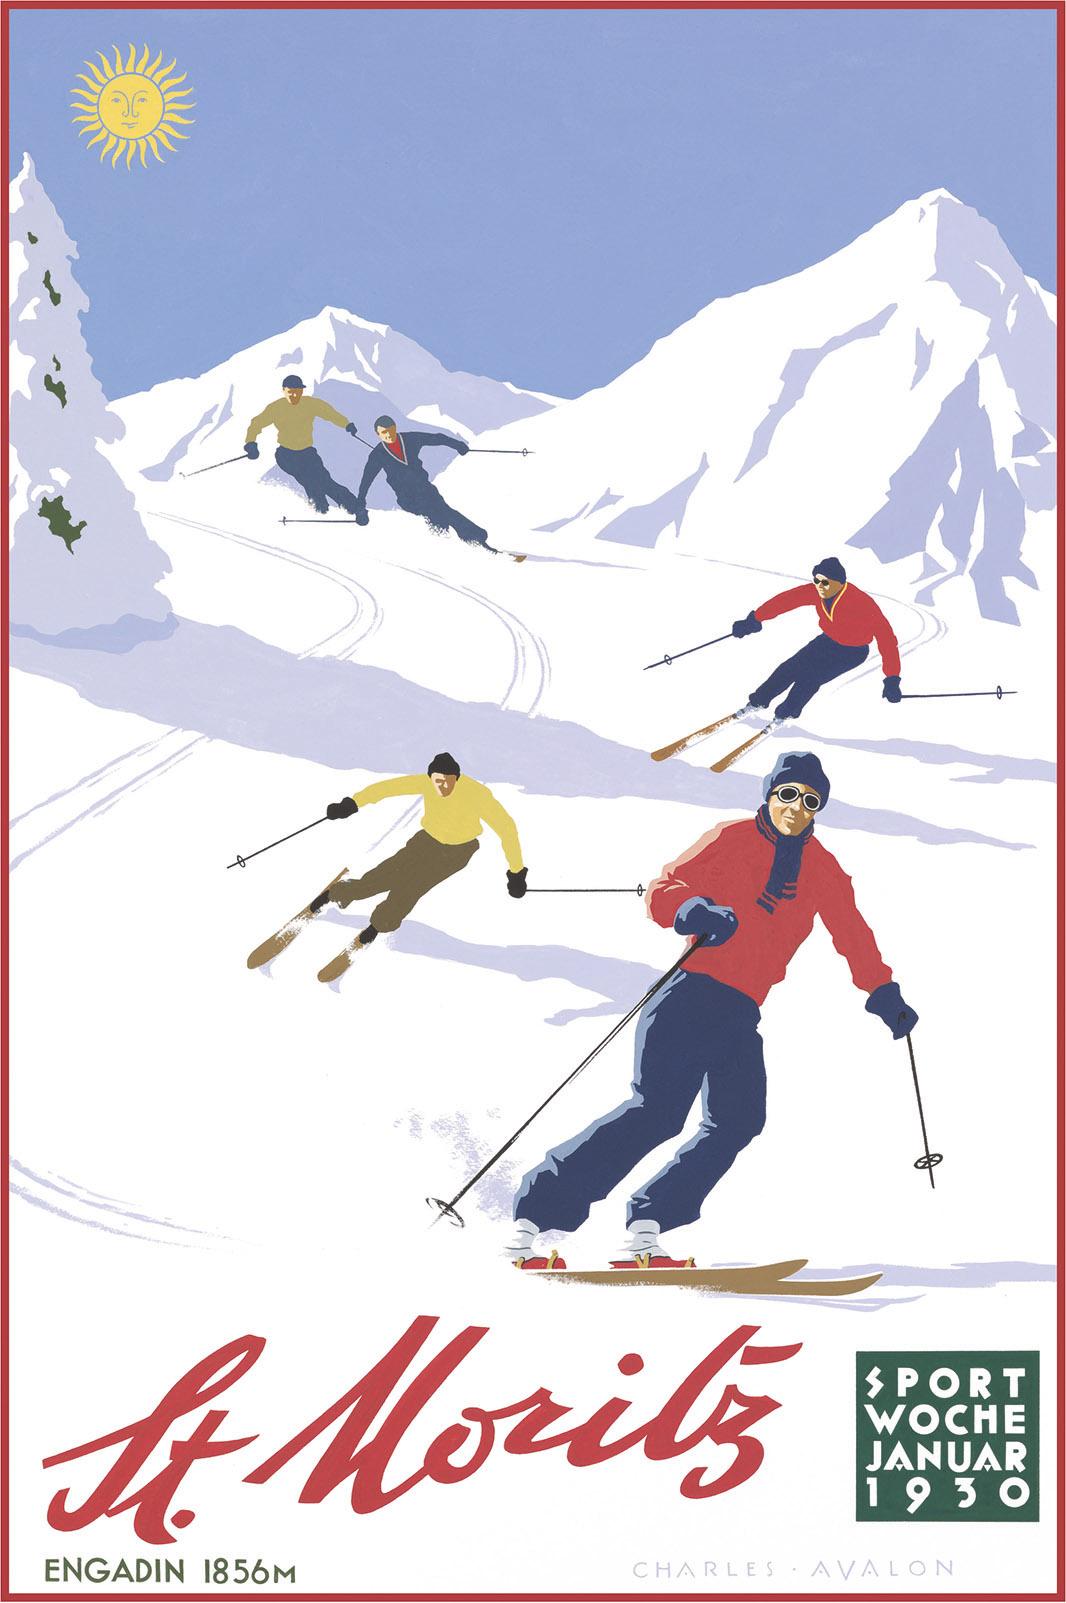 Beginning Winter Tourism 1860